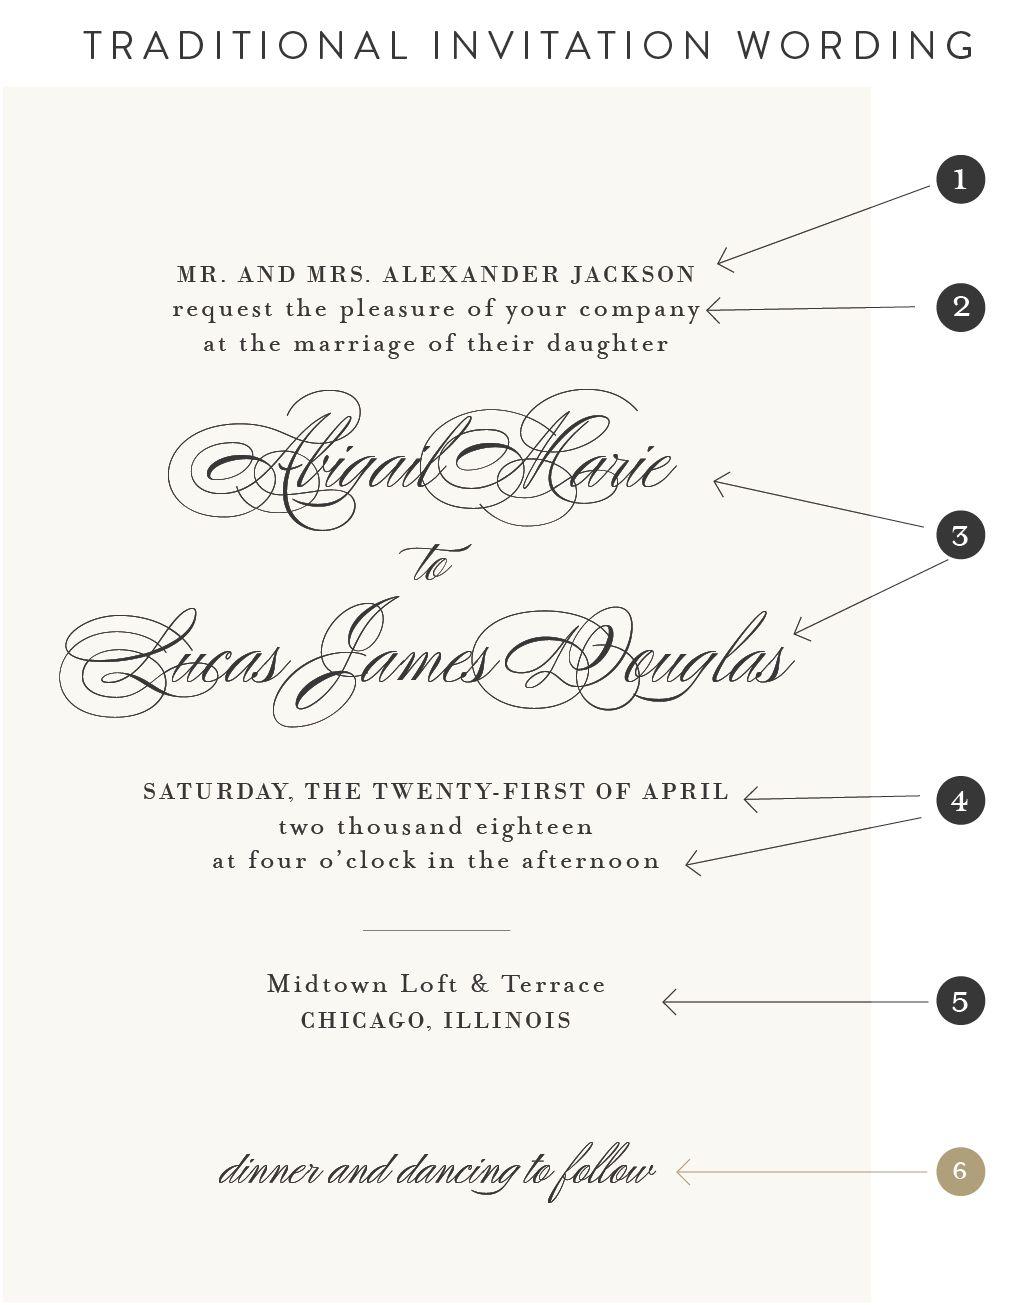 Etiquette and wording wedding invitation etiquette wedding etiquette and wording traditional wedding invitation filmwisefo